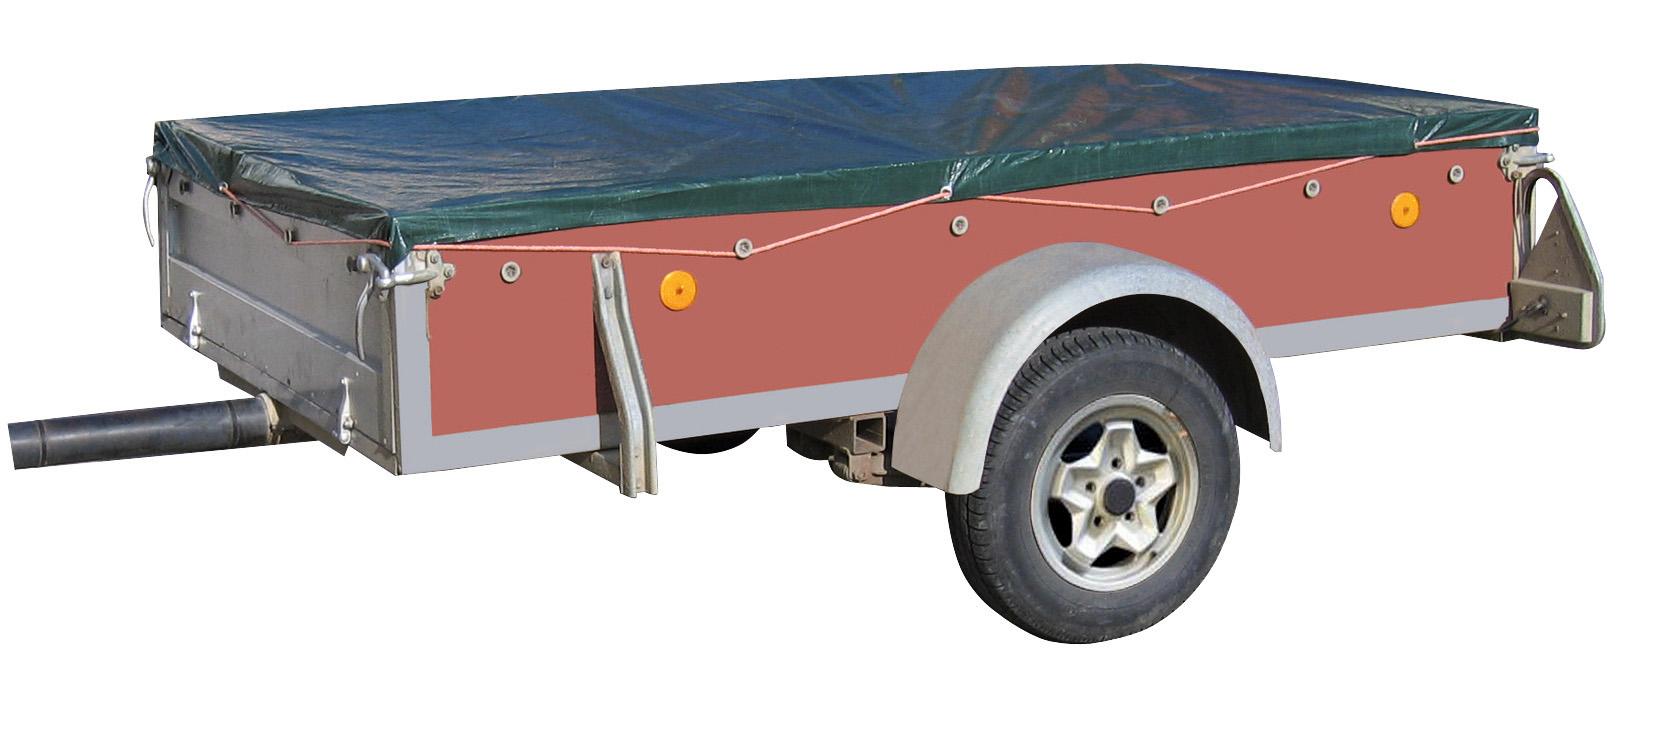 kerbl gewebe abdeckplane polyguard 110 120 g m gr n 3 x 4 m ladungssicherung. Black Bedroom Furniture Sets. Home Design Ideas